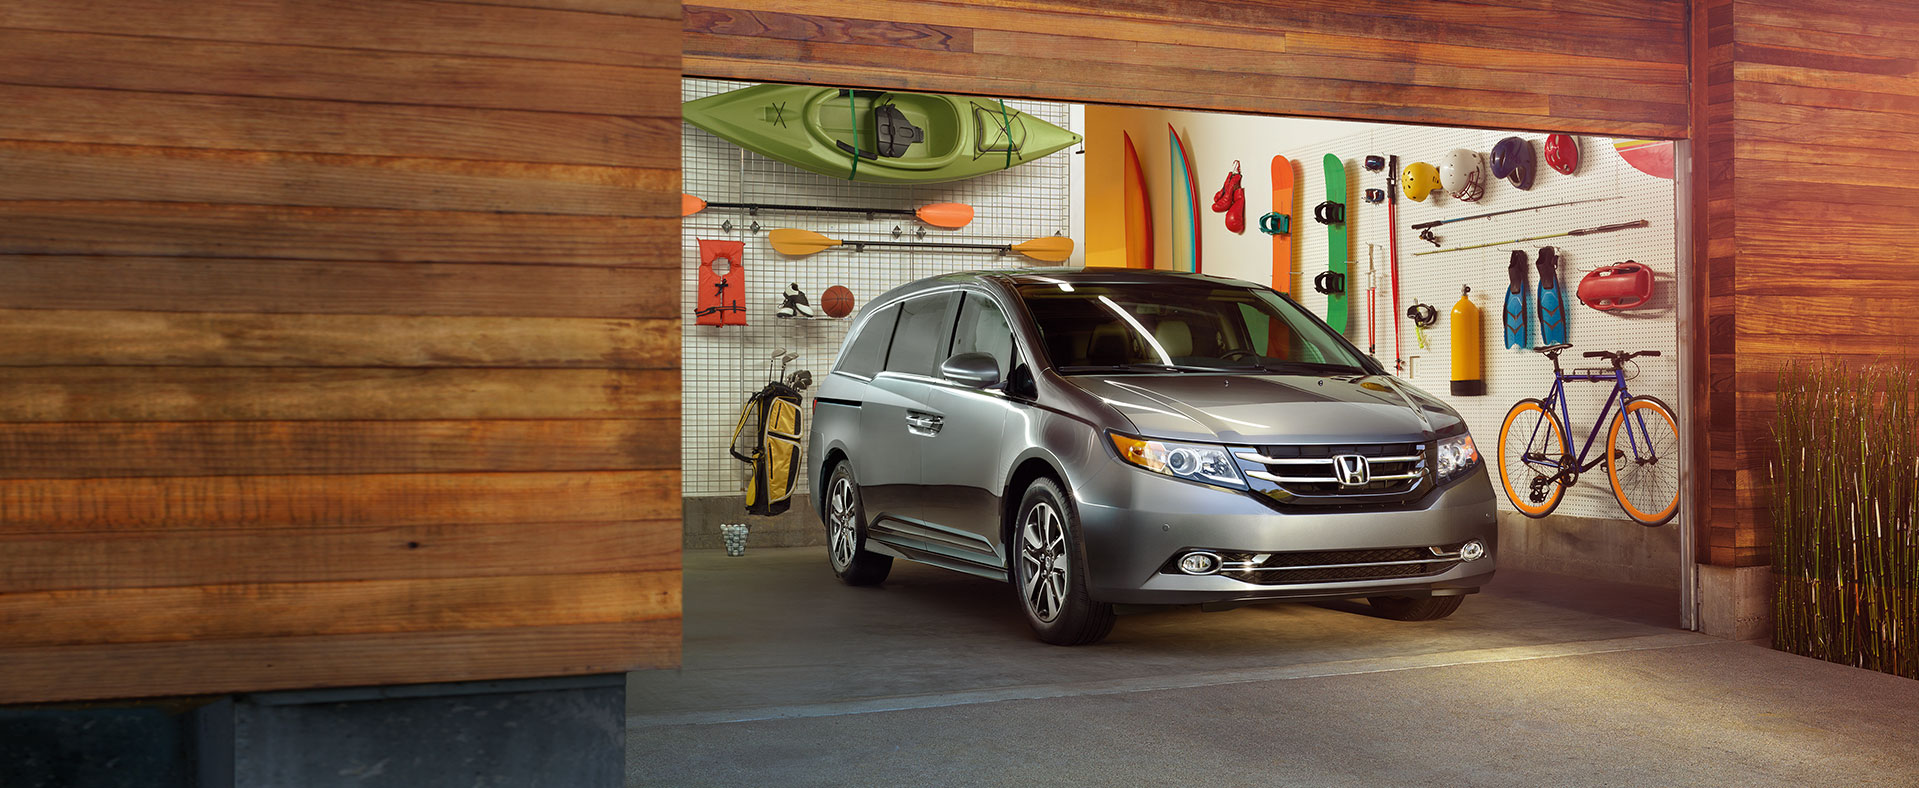 New honda odyssey specials lease offers jackson for Honda dealership jackson ms